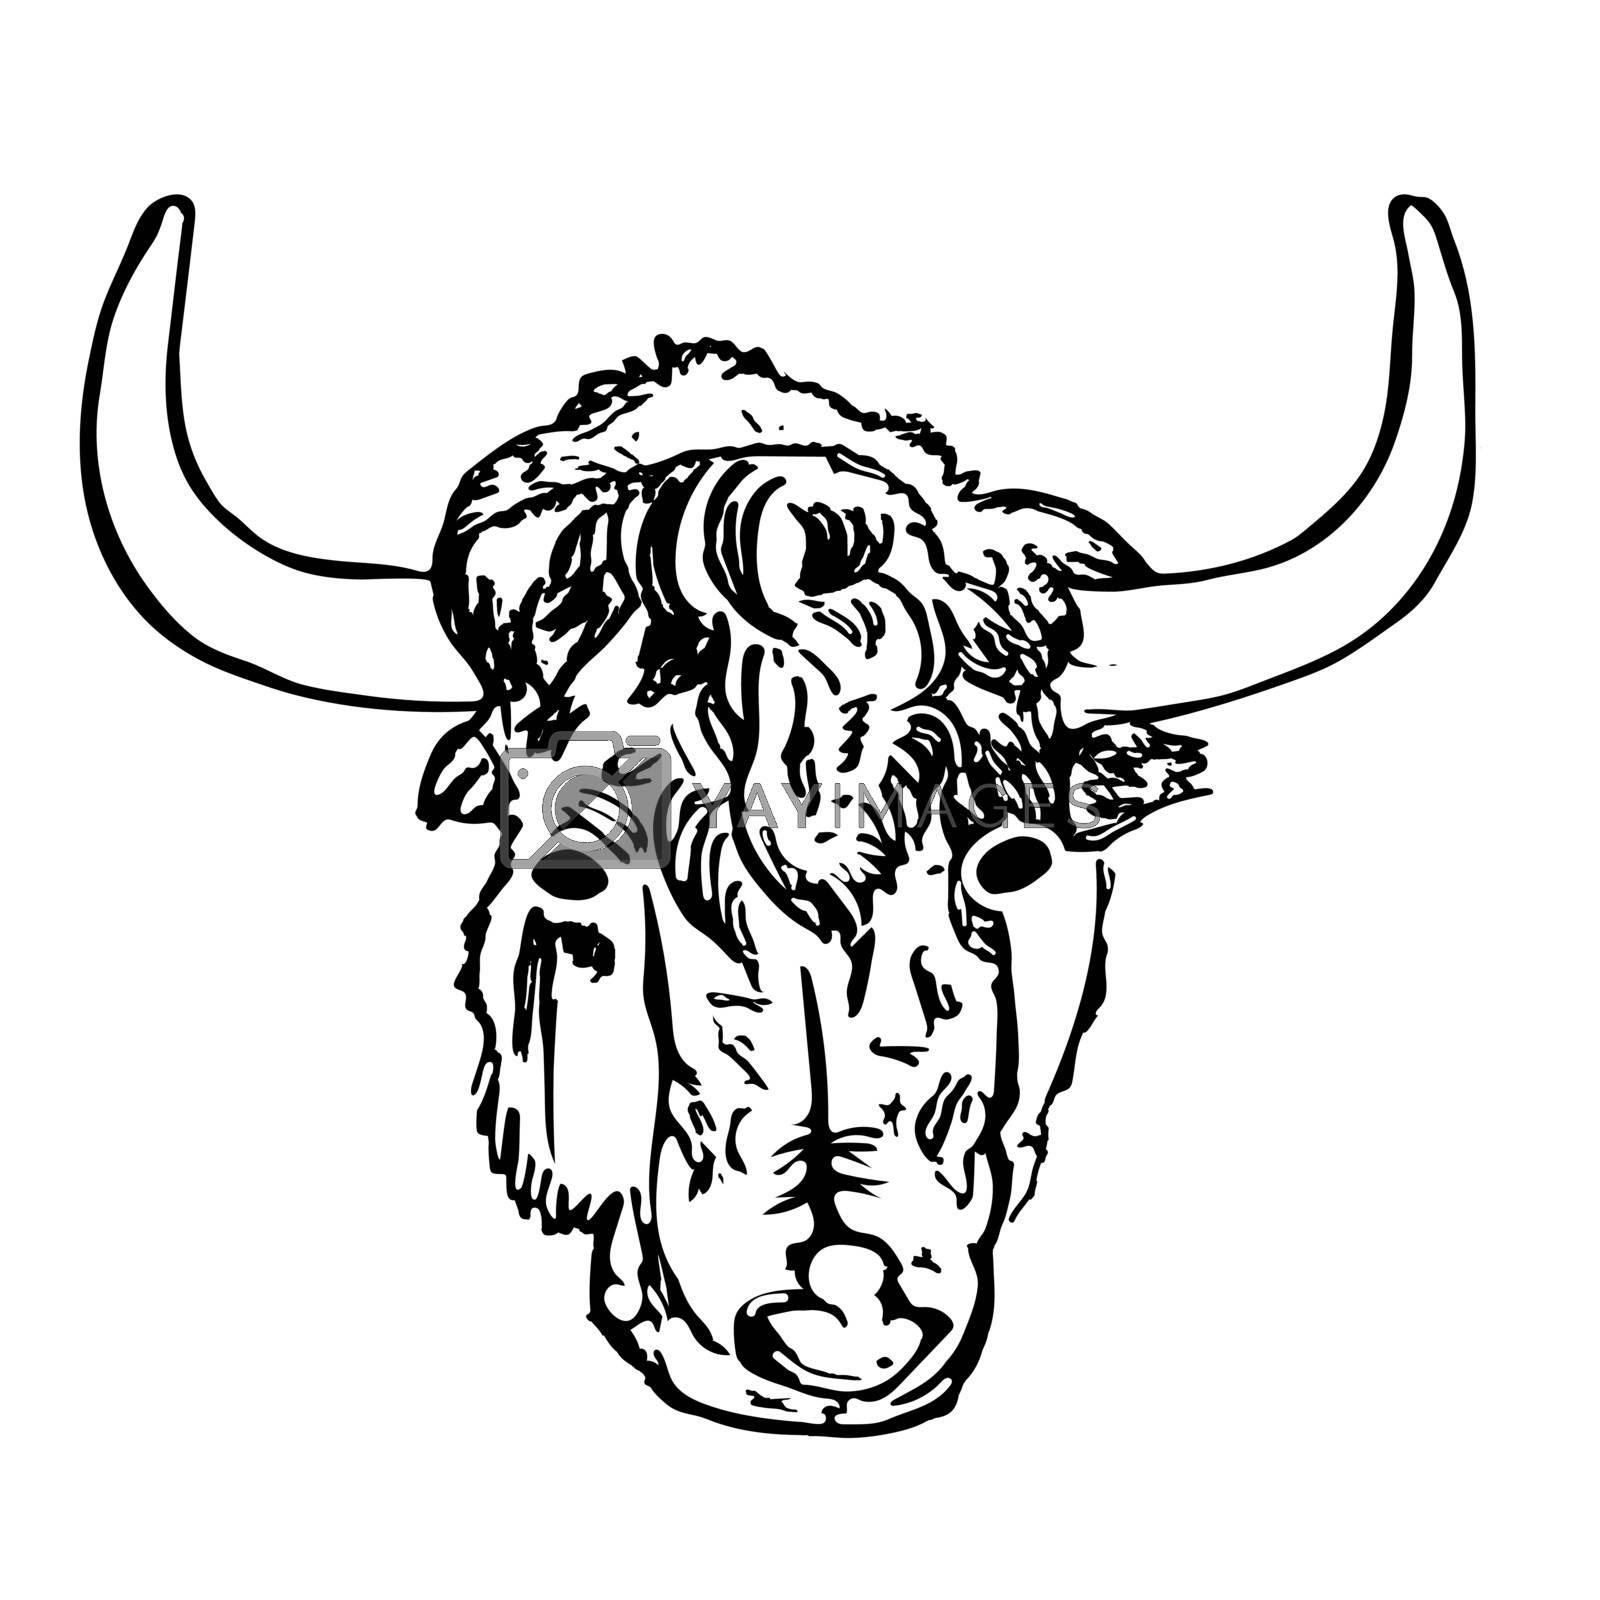 Antique engraving of highland cattle. Farmers bull. American bison. Lunar horoscope sign ox, bull, cow. Scottish rural animal. Stock vector illustration